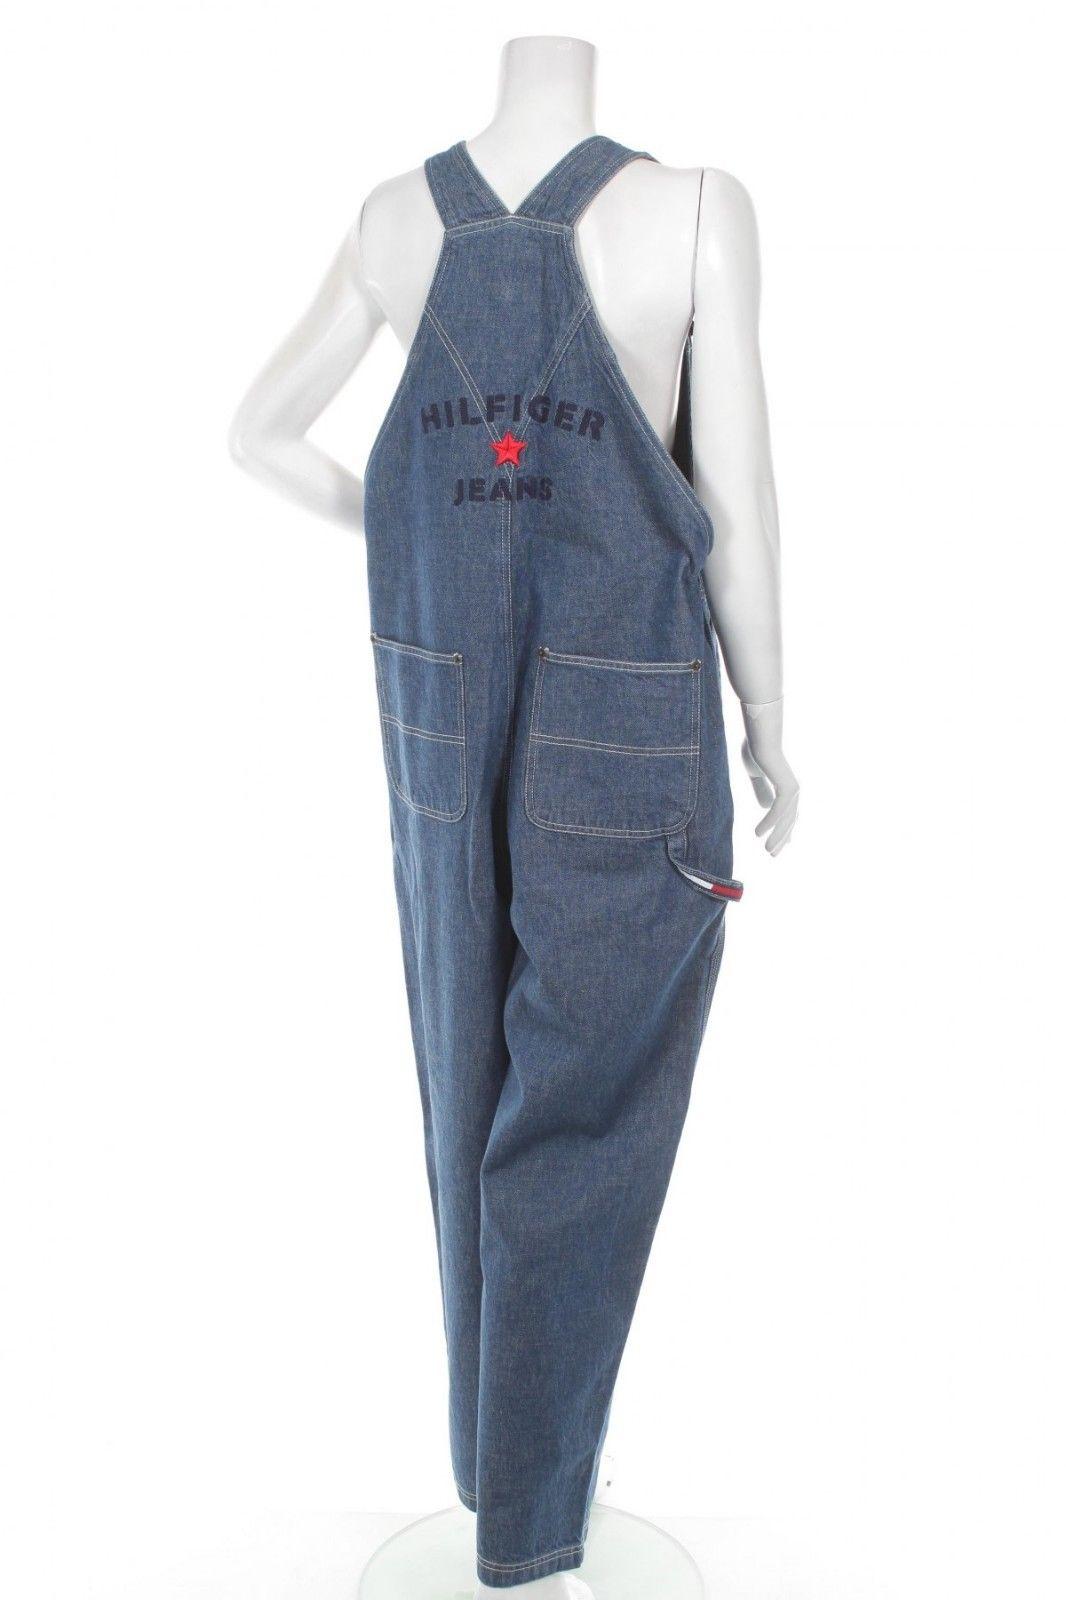 7e78685fdbf Tommy Hilfiger Jeans Women Jumpsuit 1990s Vintage Denim Bib Overalls ...